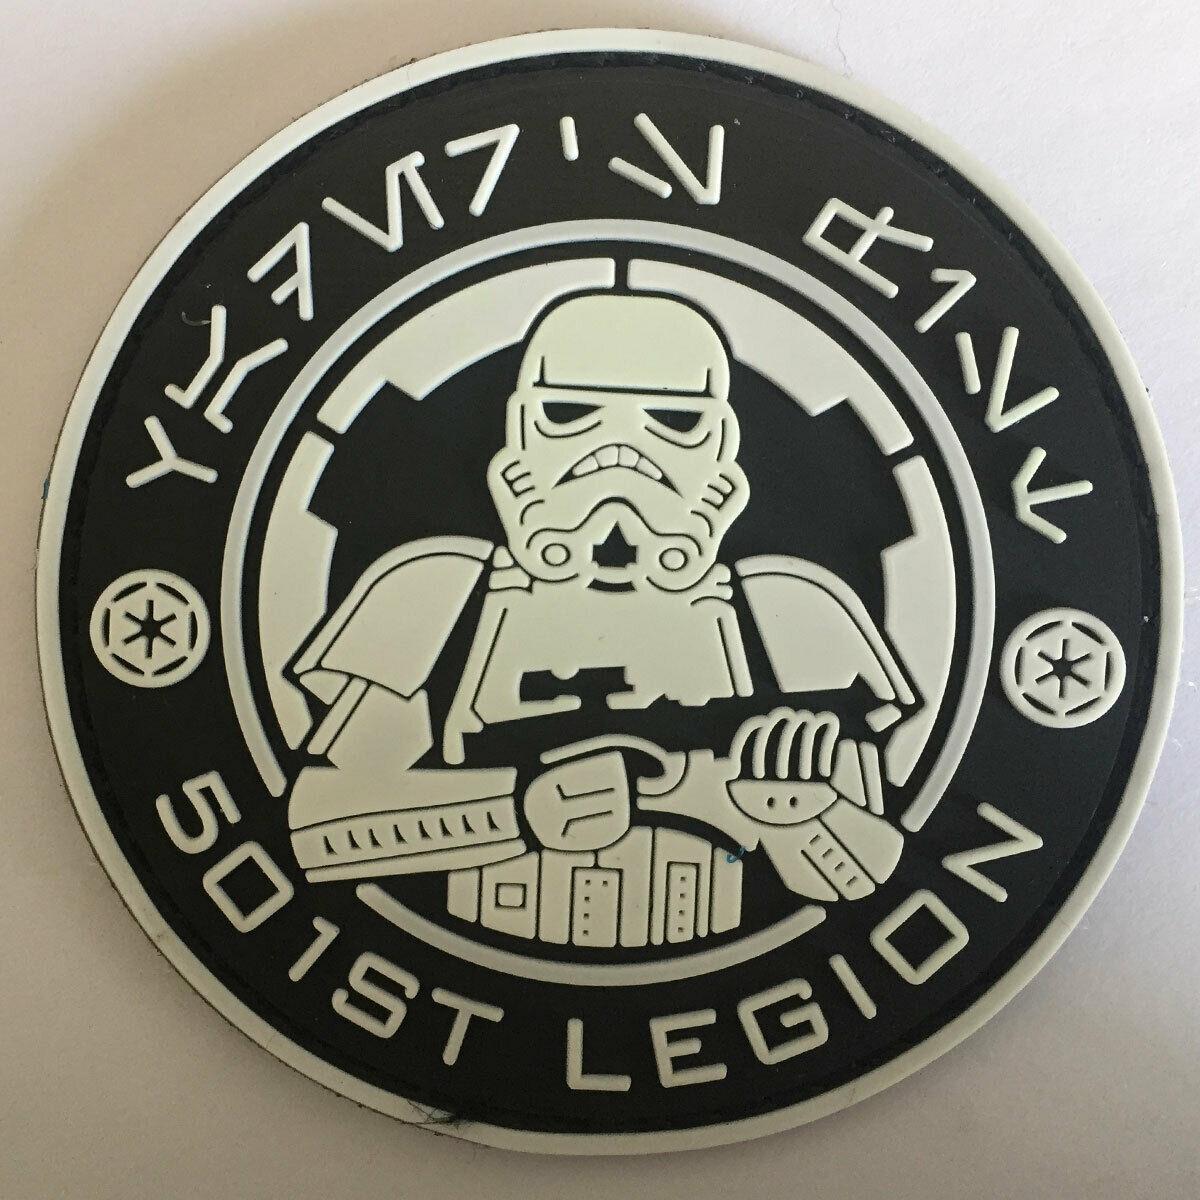 Details about Star Wars Galactic Empire 501st Legion Stormtrooper Tactical  Morale Emblem Patch.